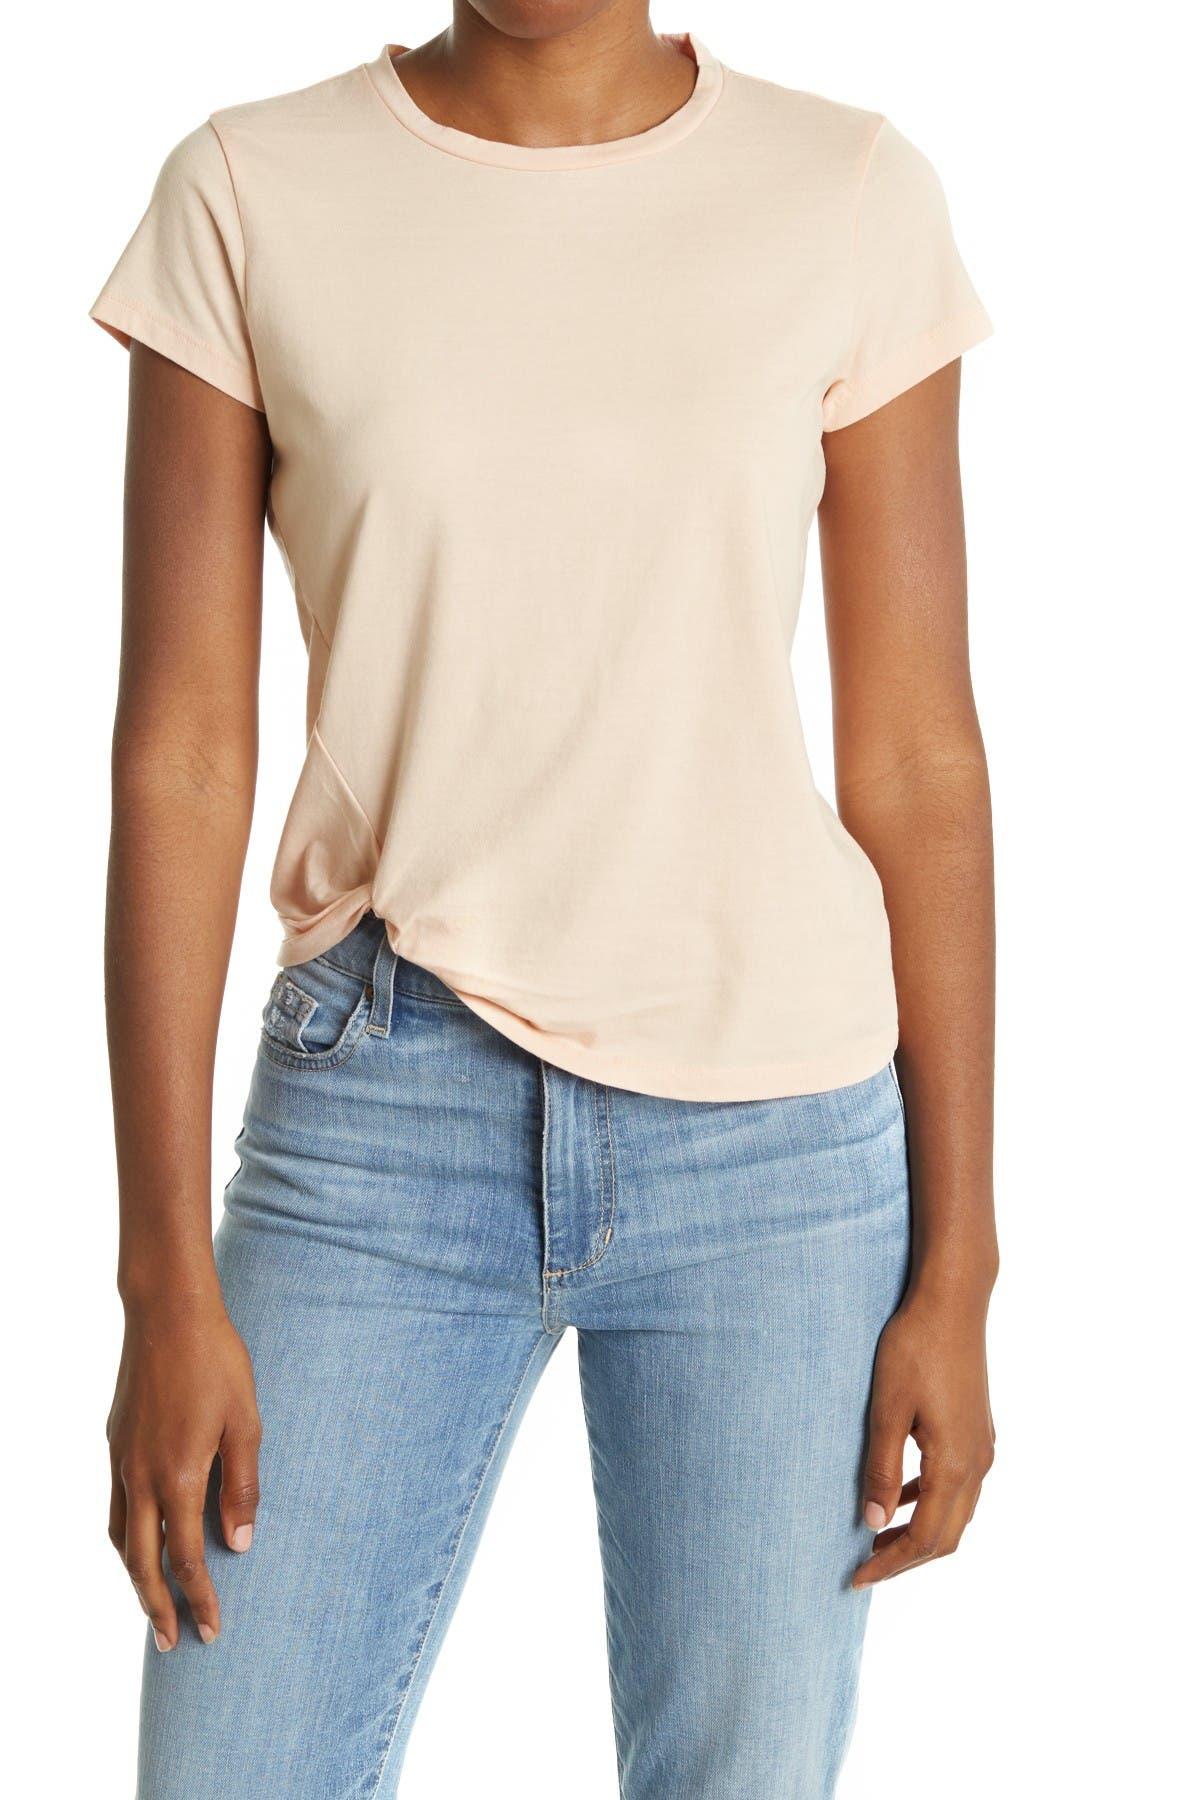 Image of ALLSAINTS Mellon Twisted Hem T-Shirt